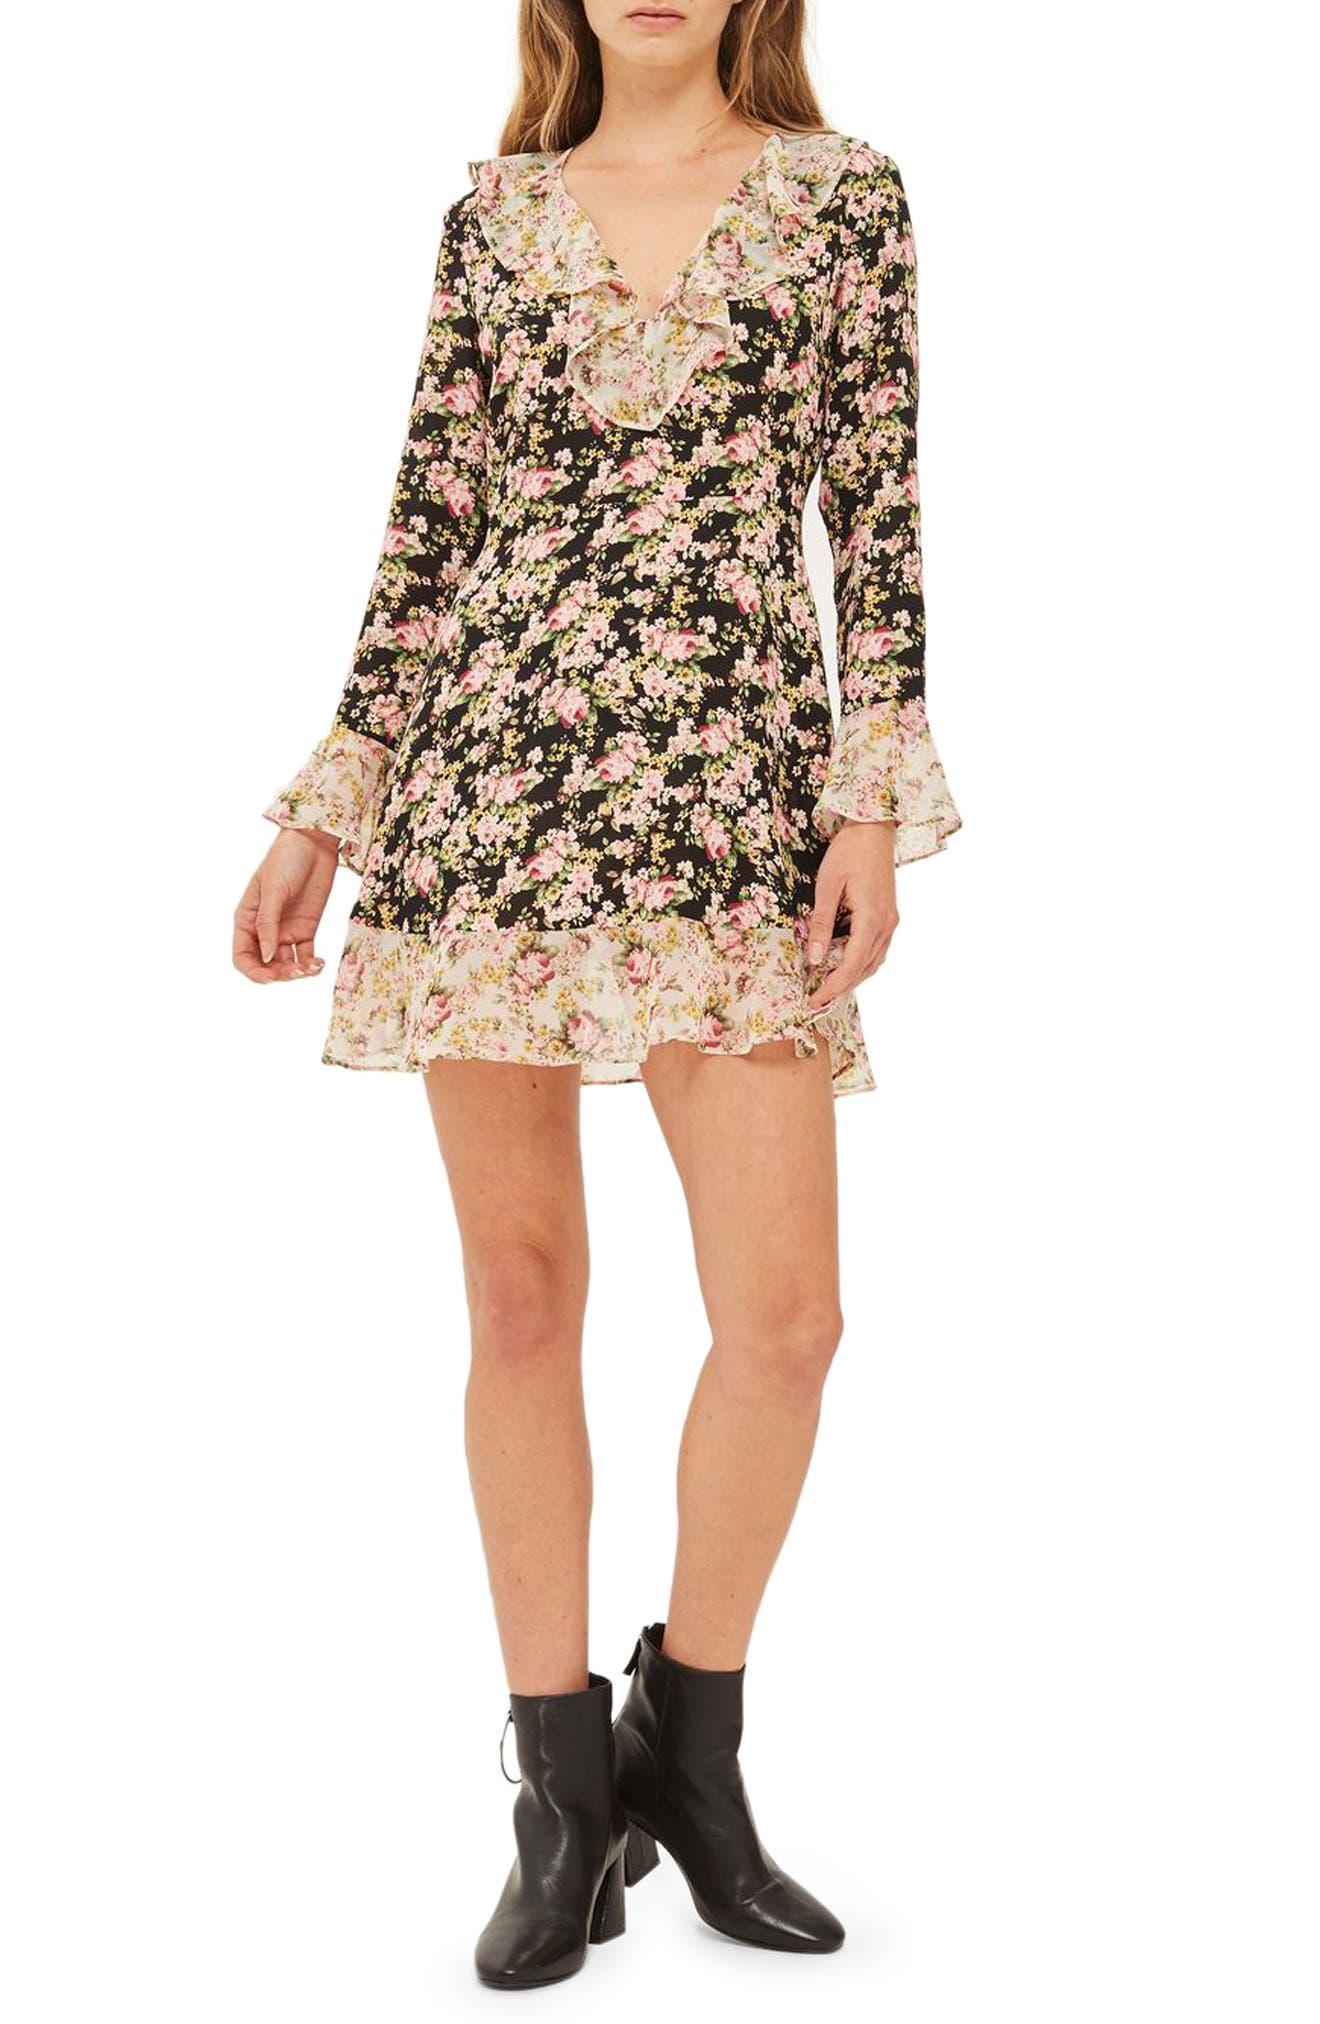 True Romance Ruffle Minidress,                         Main,                         color, Black Multi